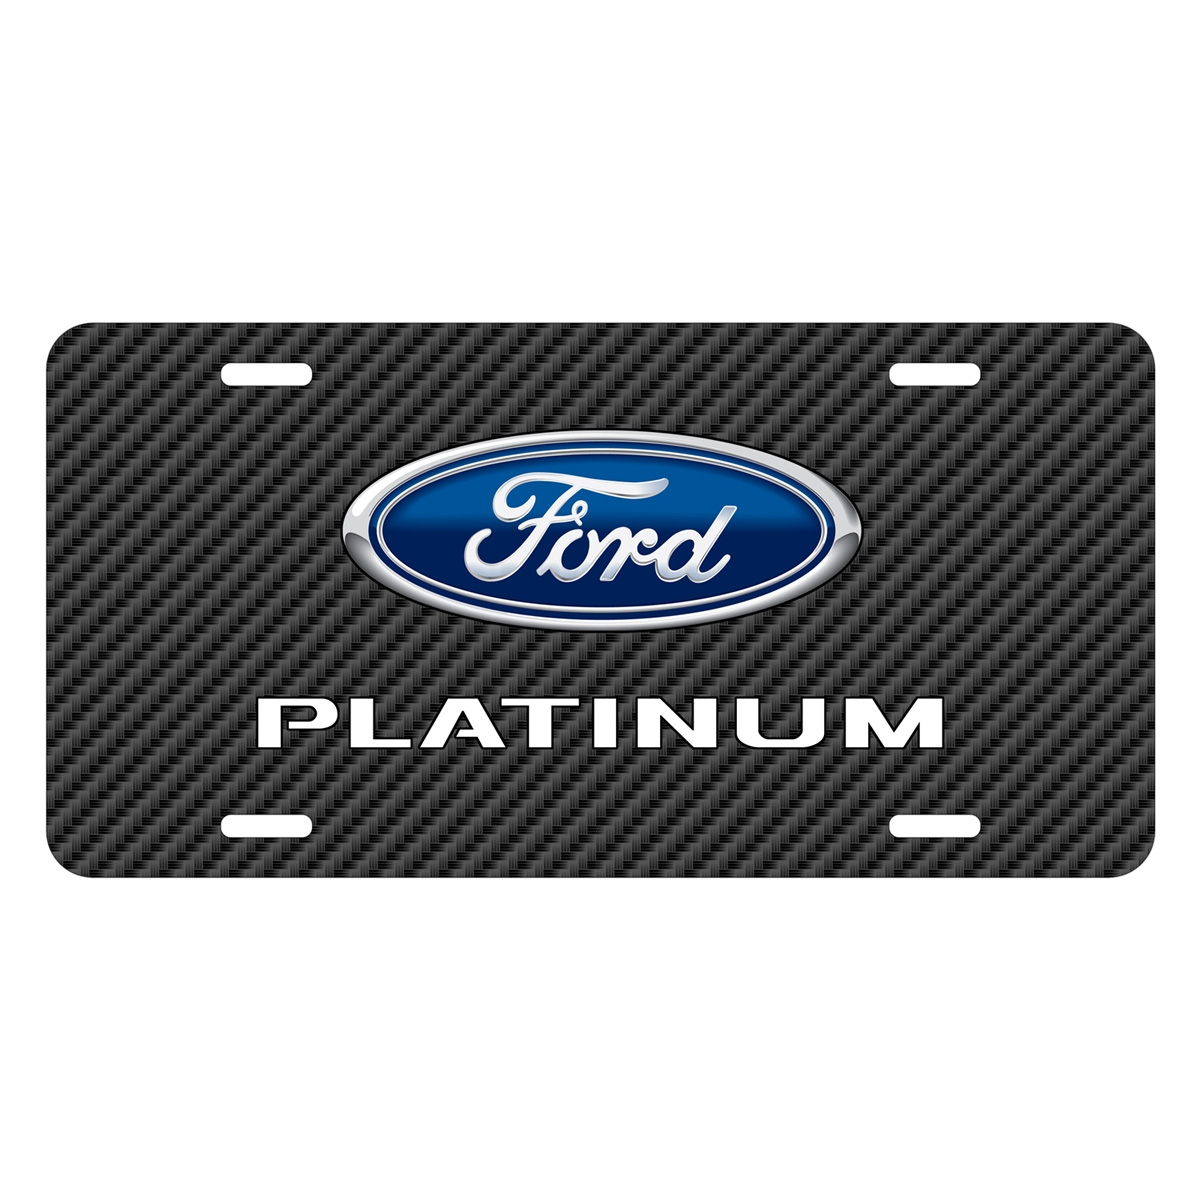 Ford F-150 Platinum Black Carbon Fiber Texture Graphic UV Metal License Plate